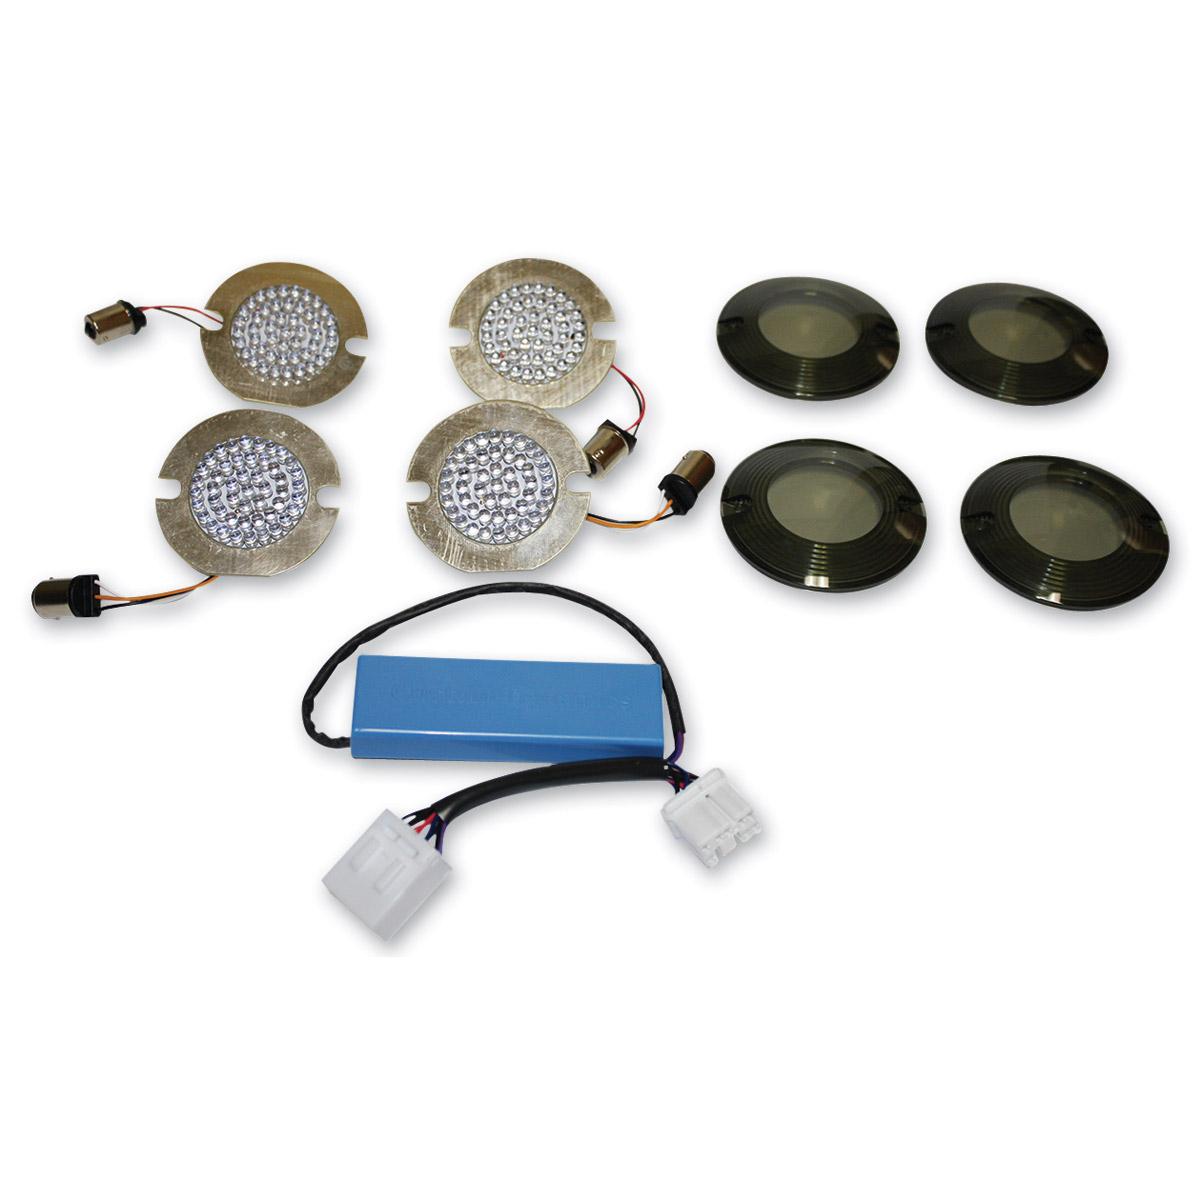 Custom Dynamics LED Turn Signal Conversion Kit with Smoke Lens